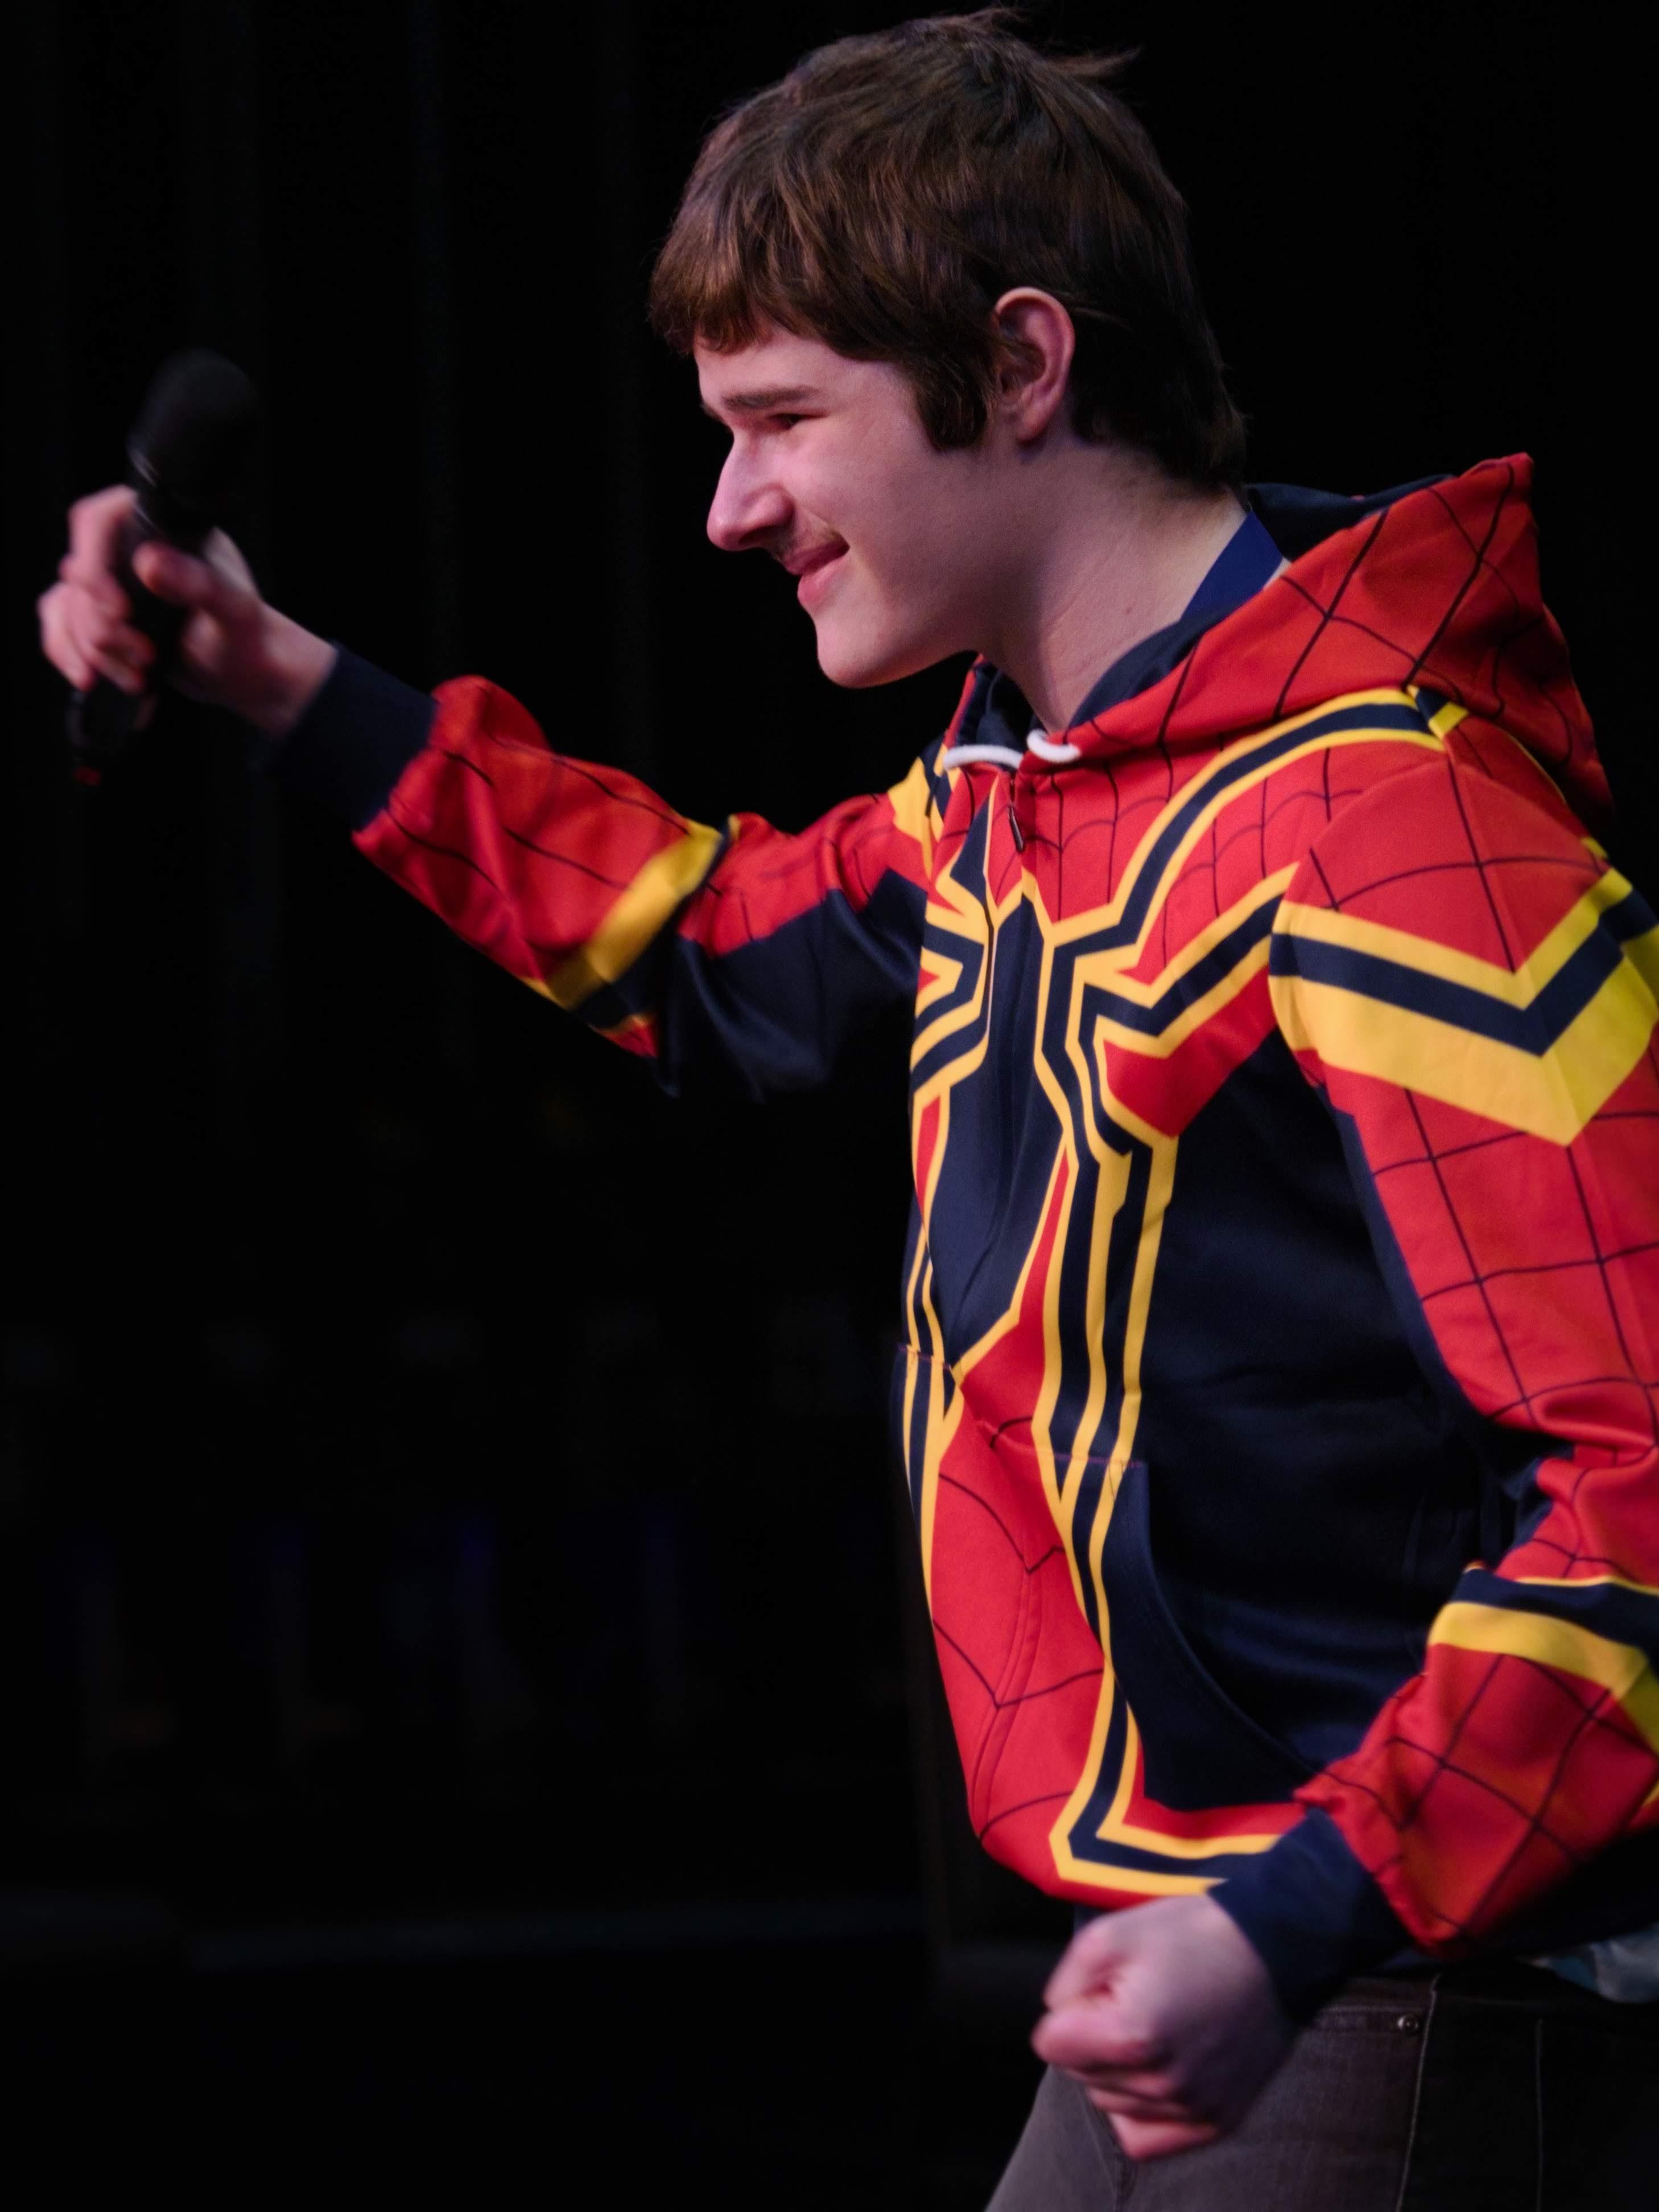 WGE Parasteddfod Keith Pyle Performs